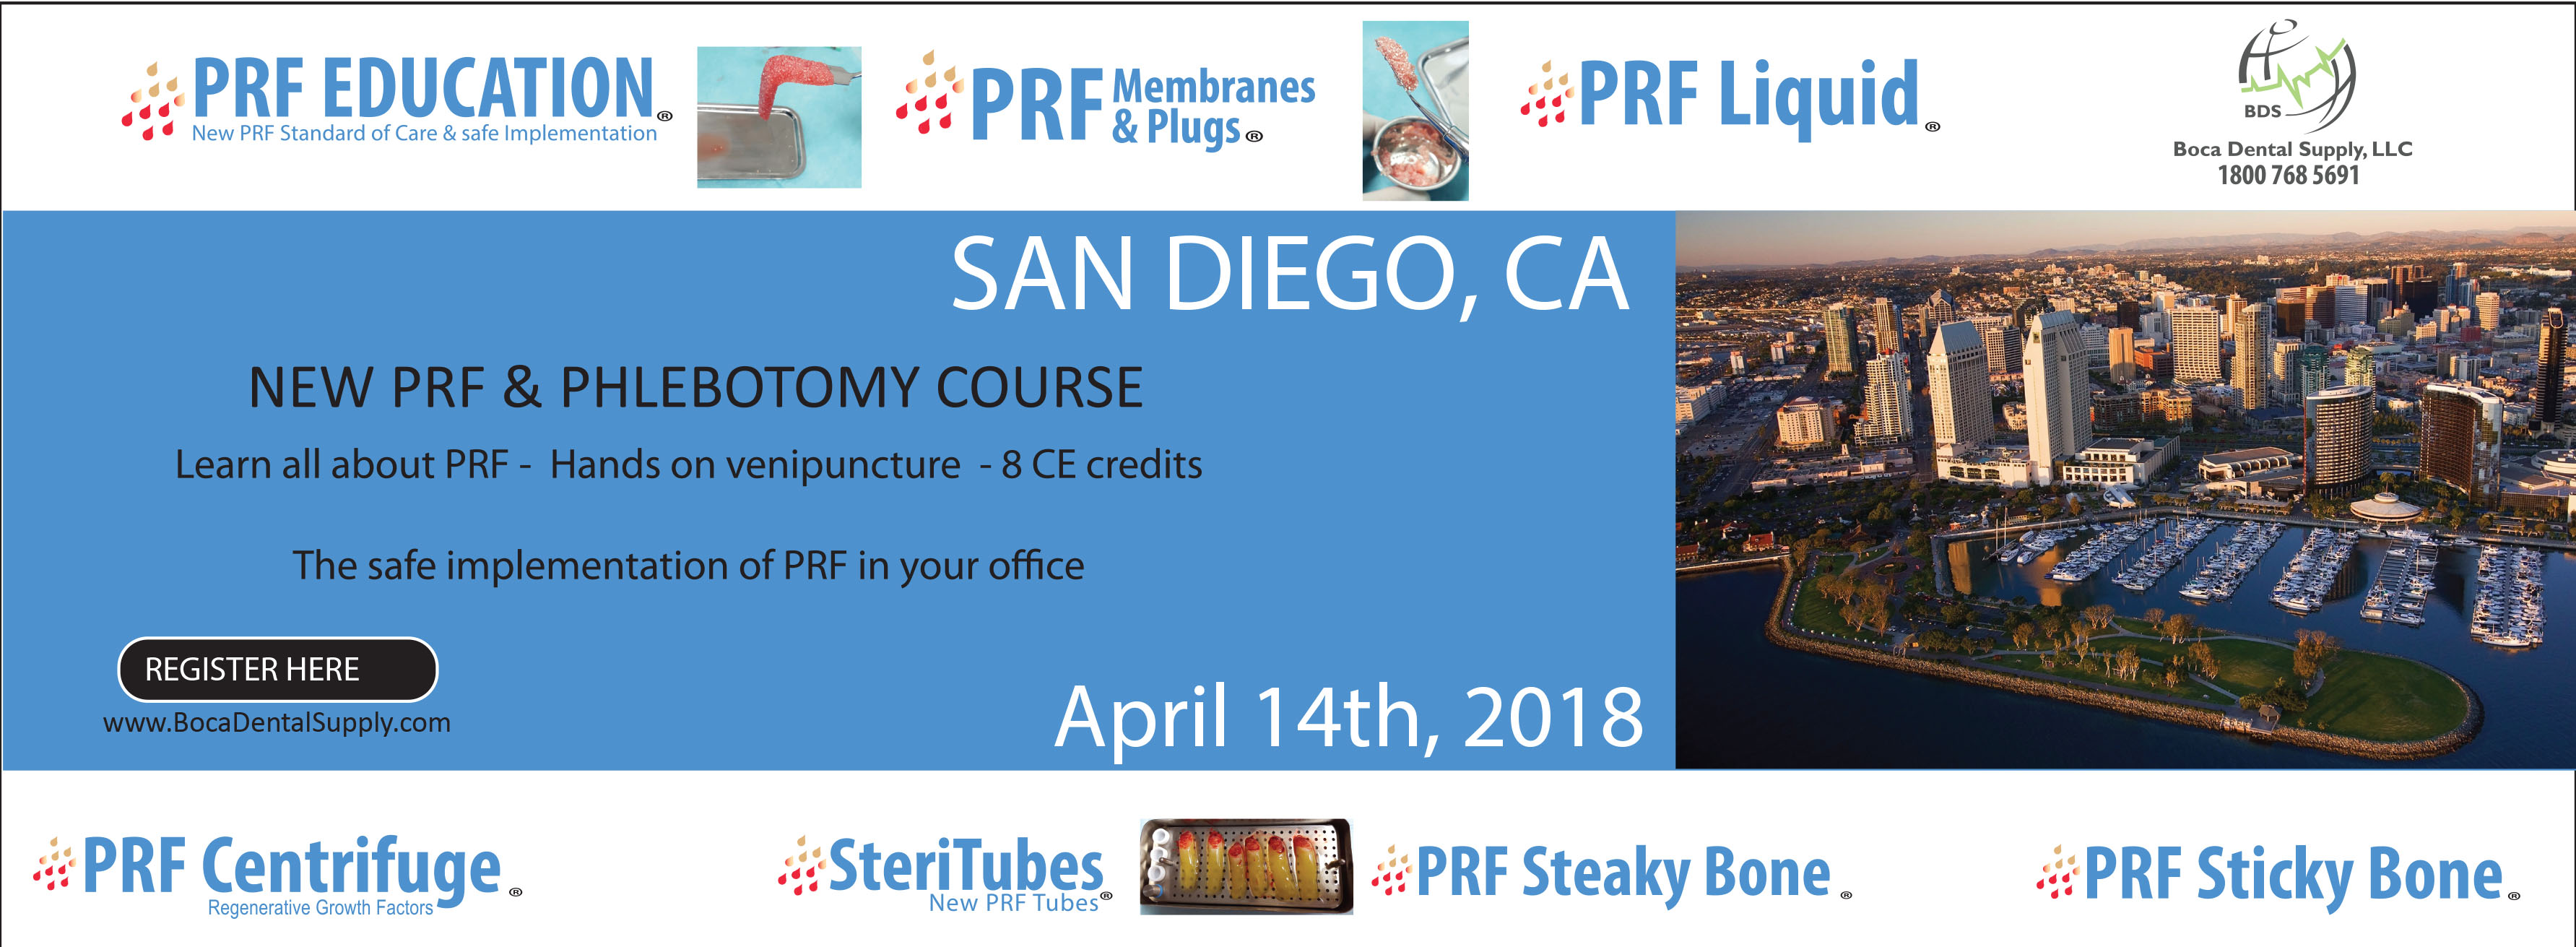 prf-course-san-diego-april-14-2018.jpg